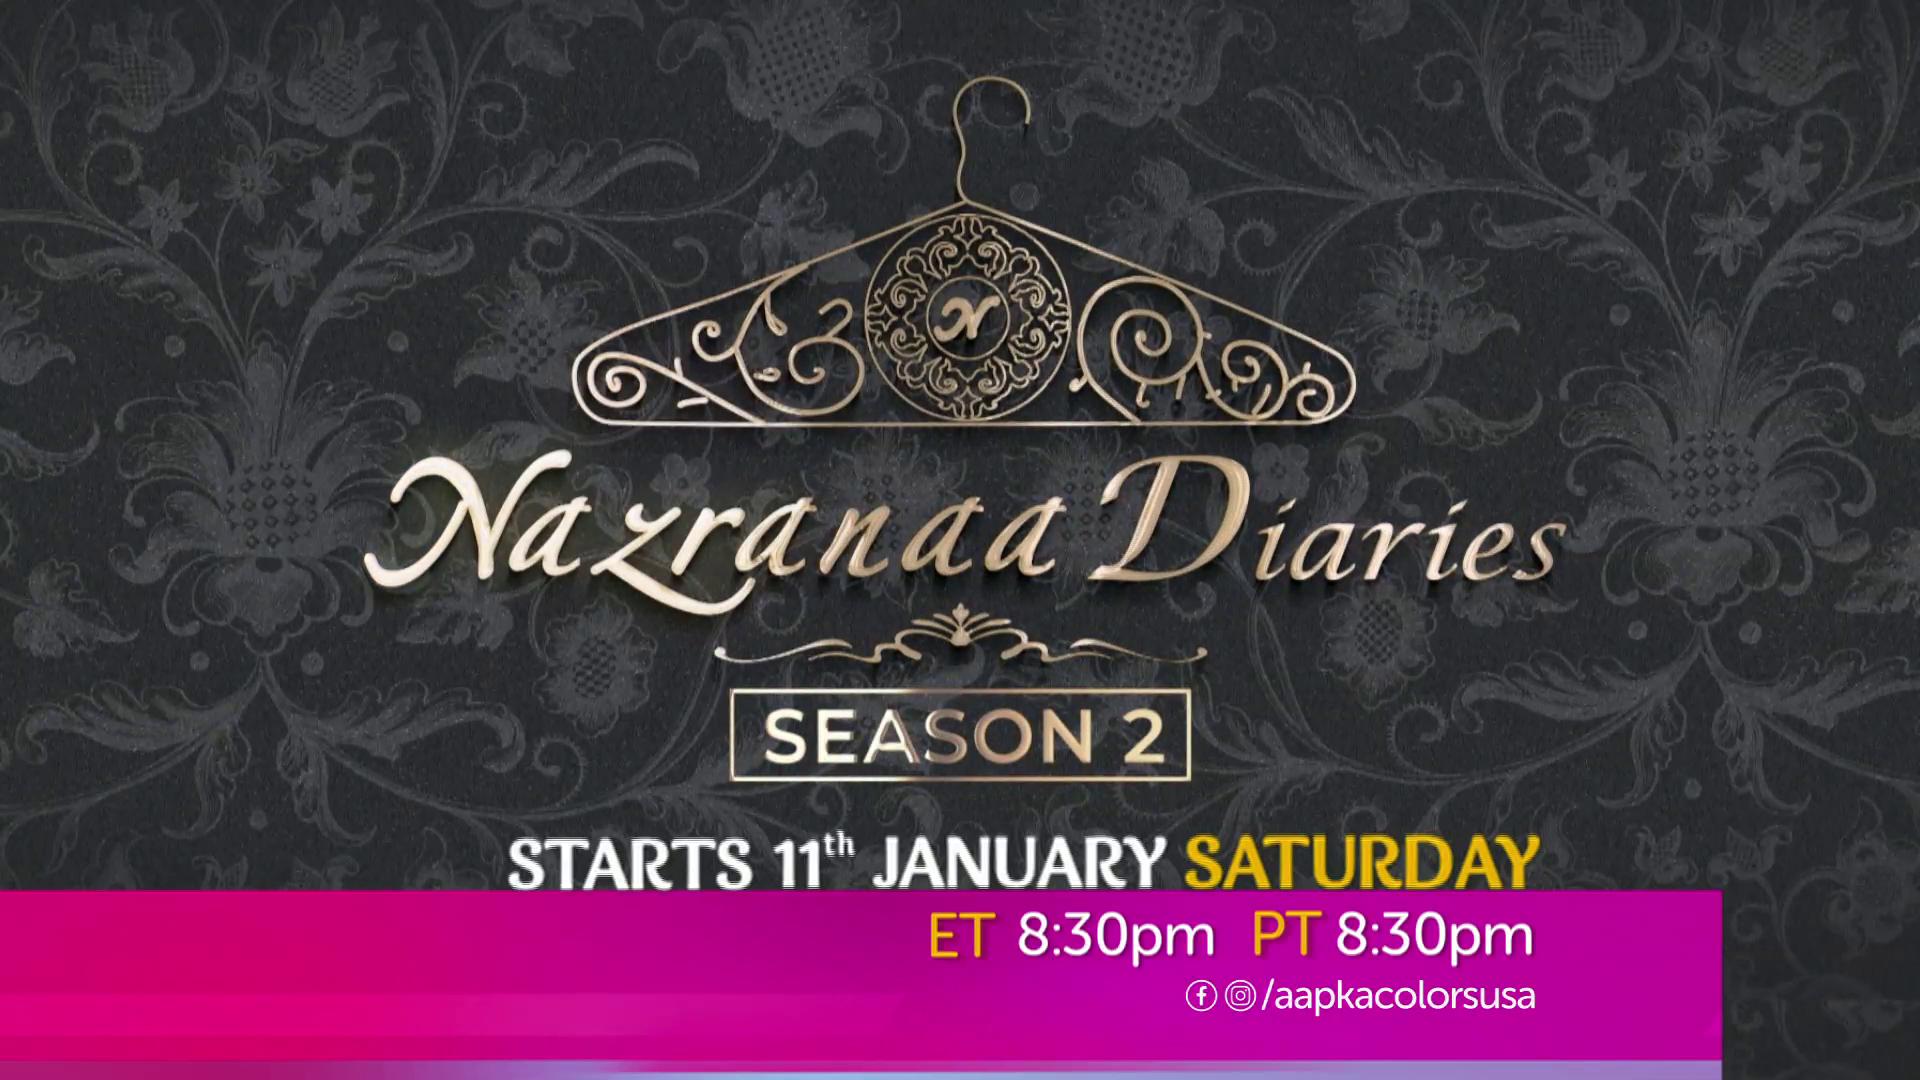 Nazranaa Diaries Season 2 Starts 11th Jan Every Sat 8:30 PM ET/PT